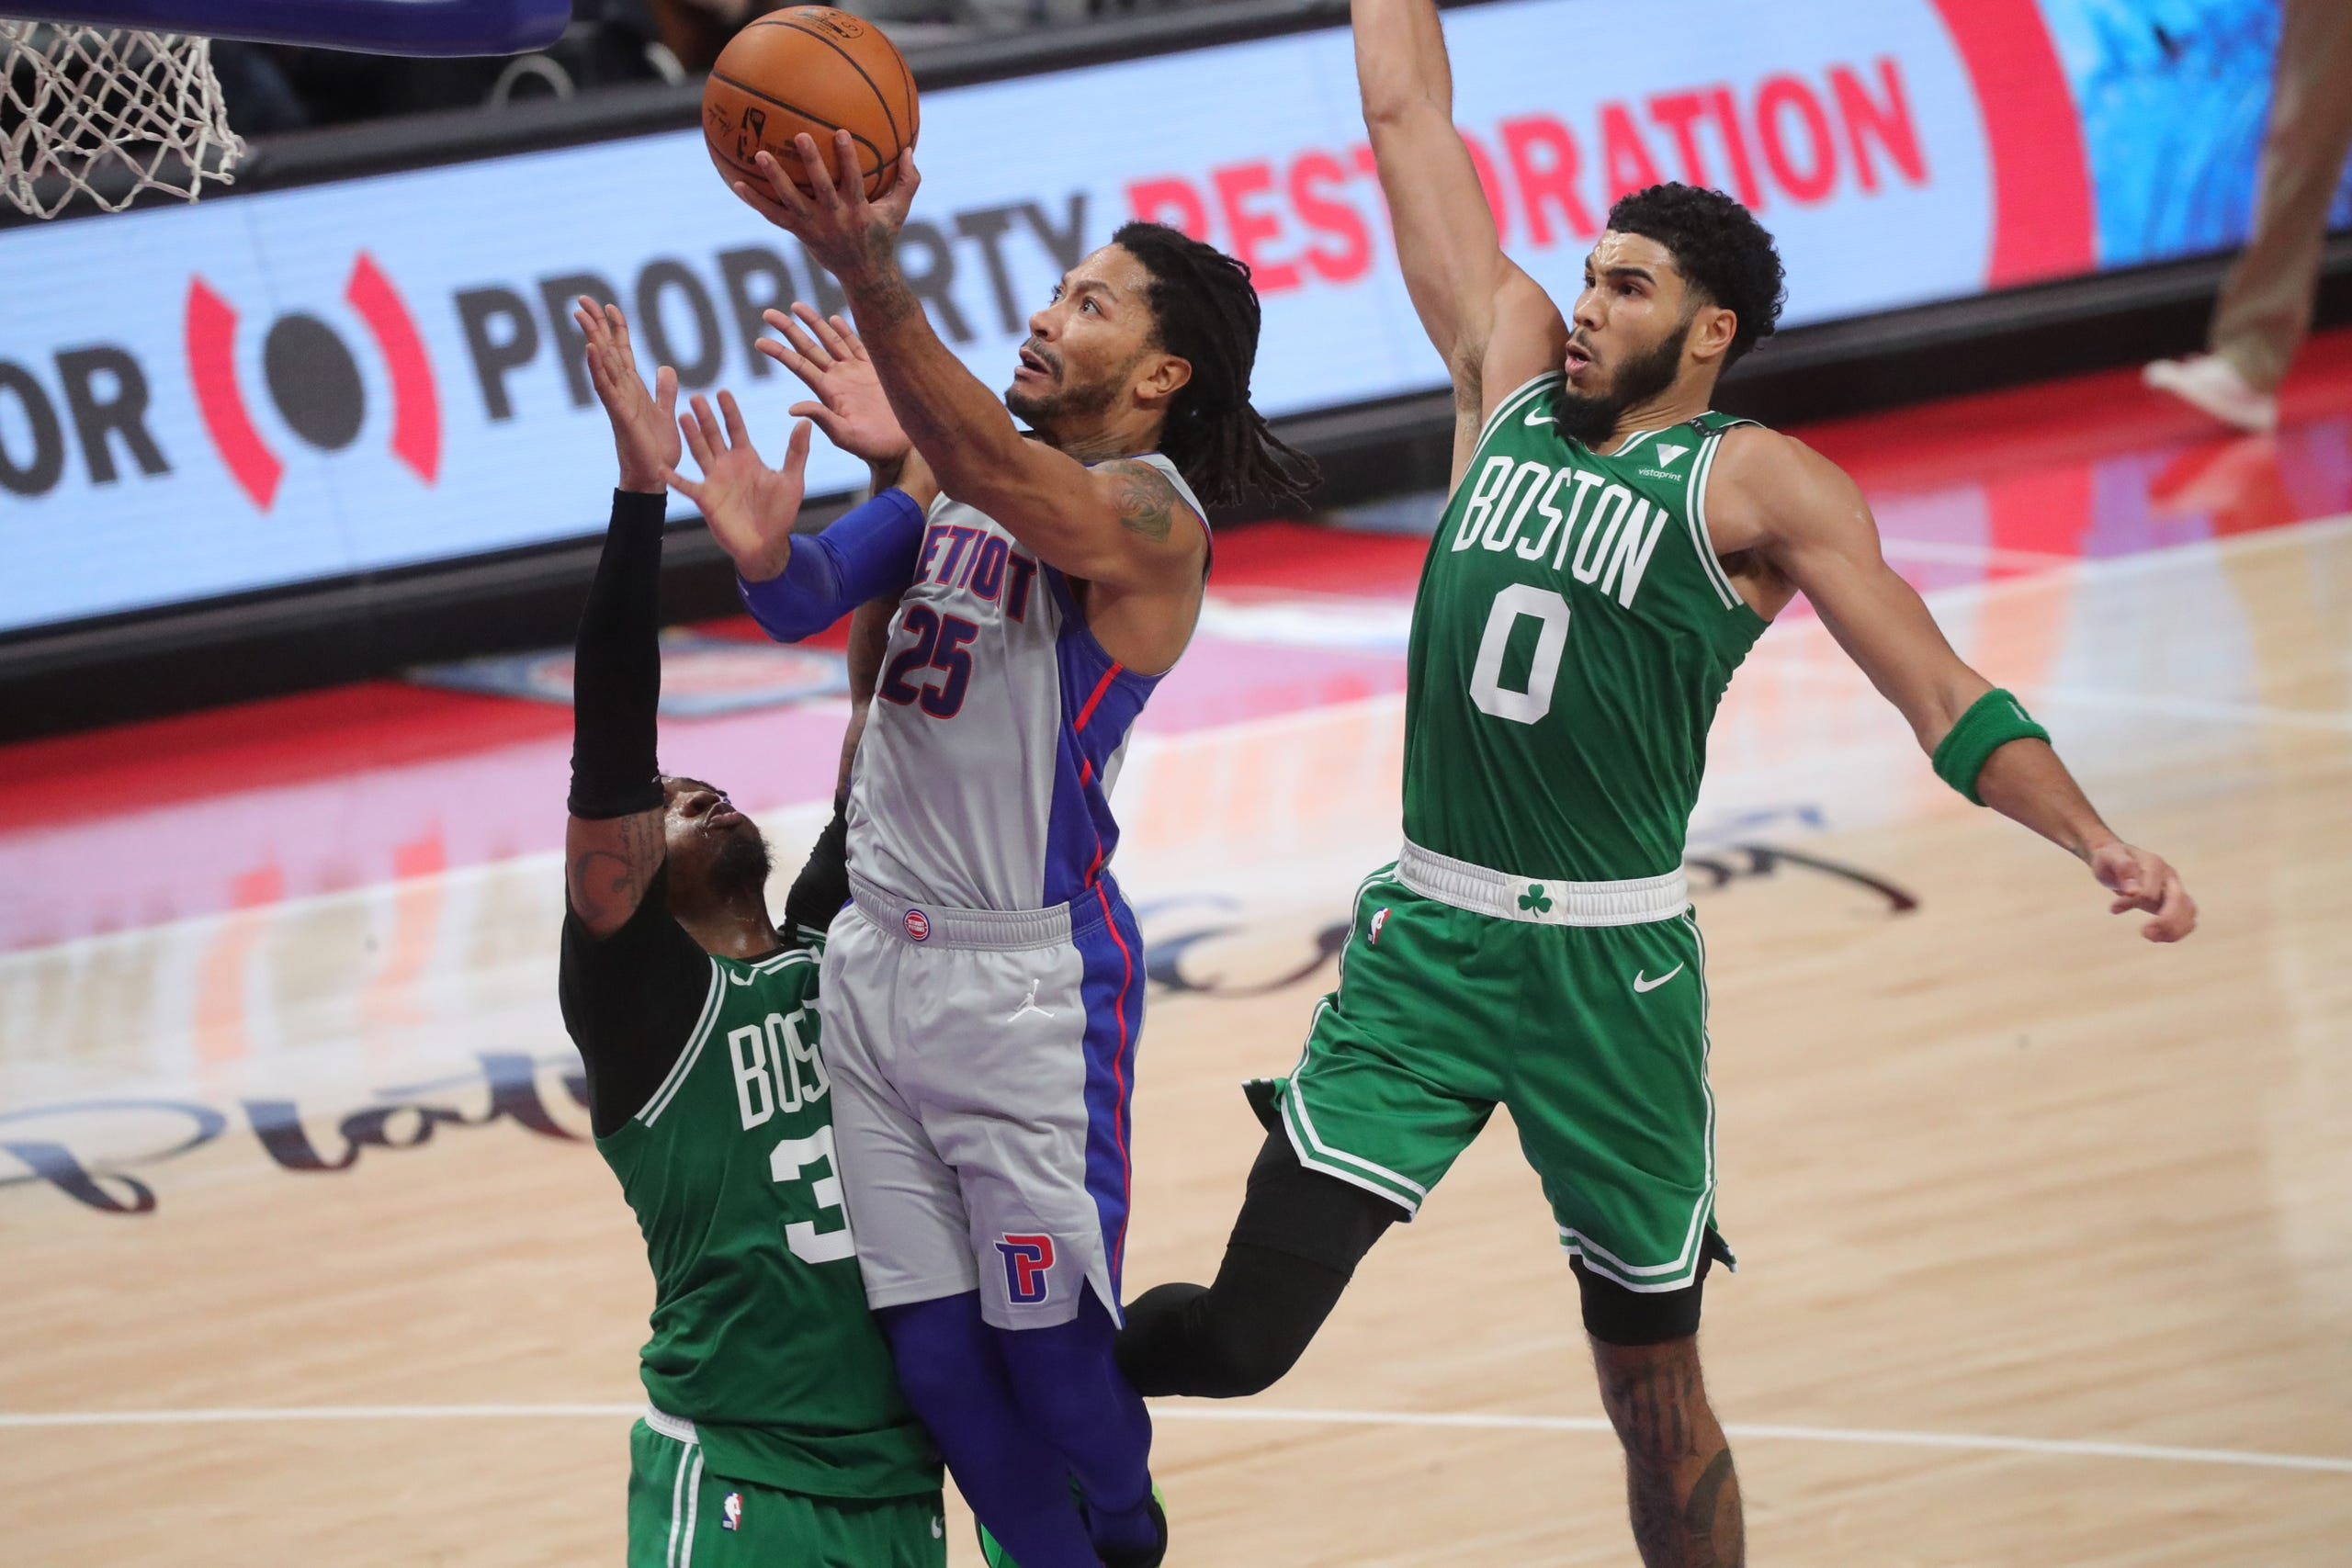 Detroit Pistons 96, Boston Celtics 93: Best photos from first win